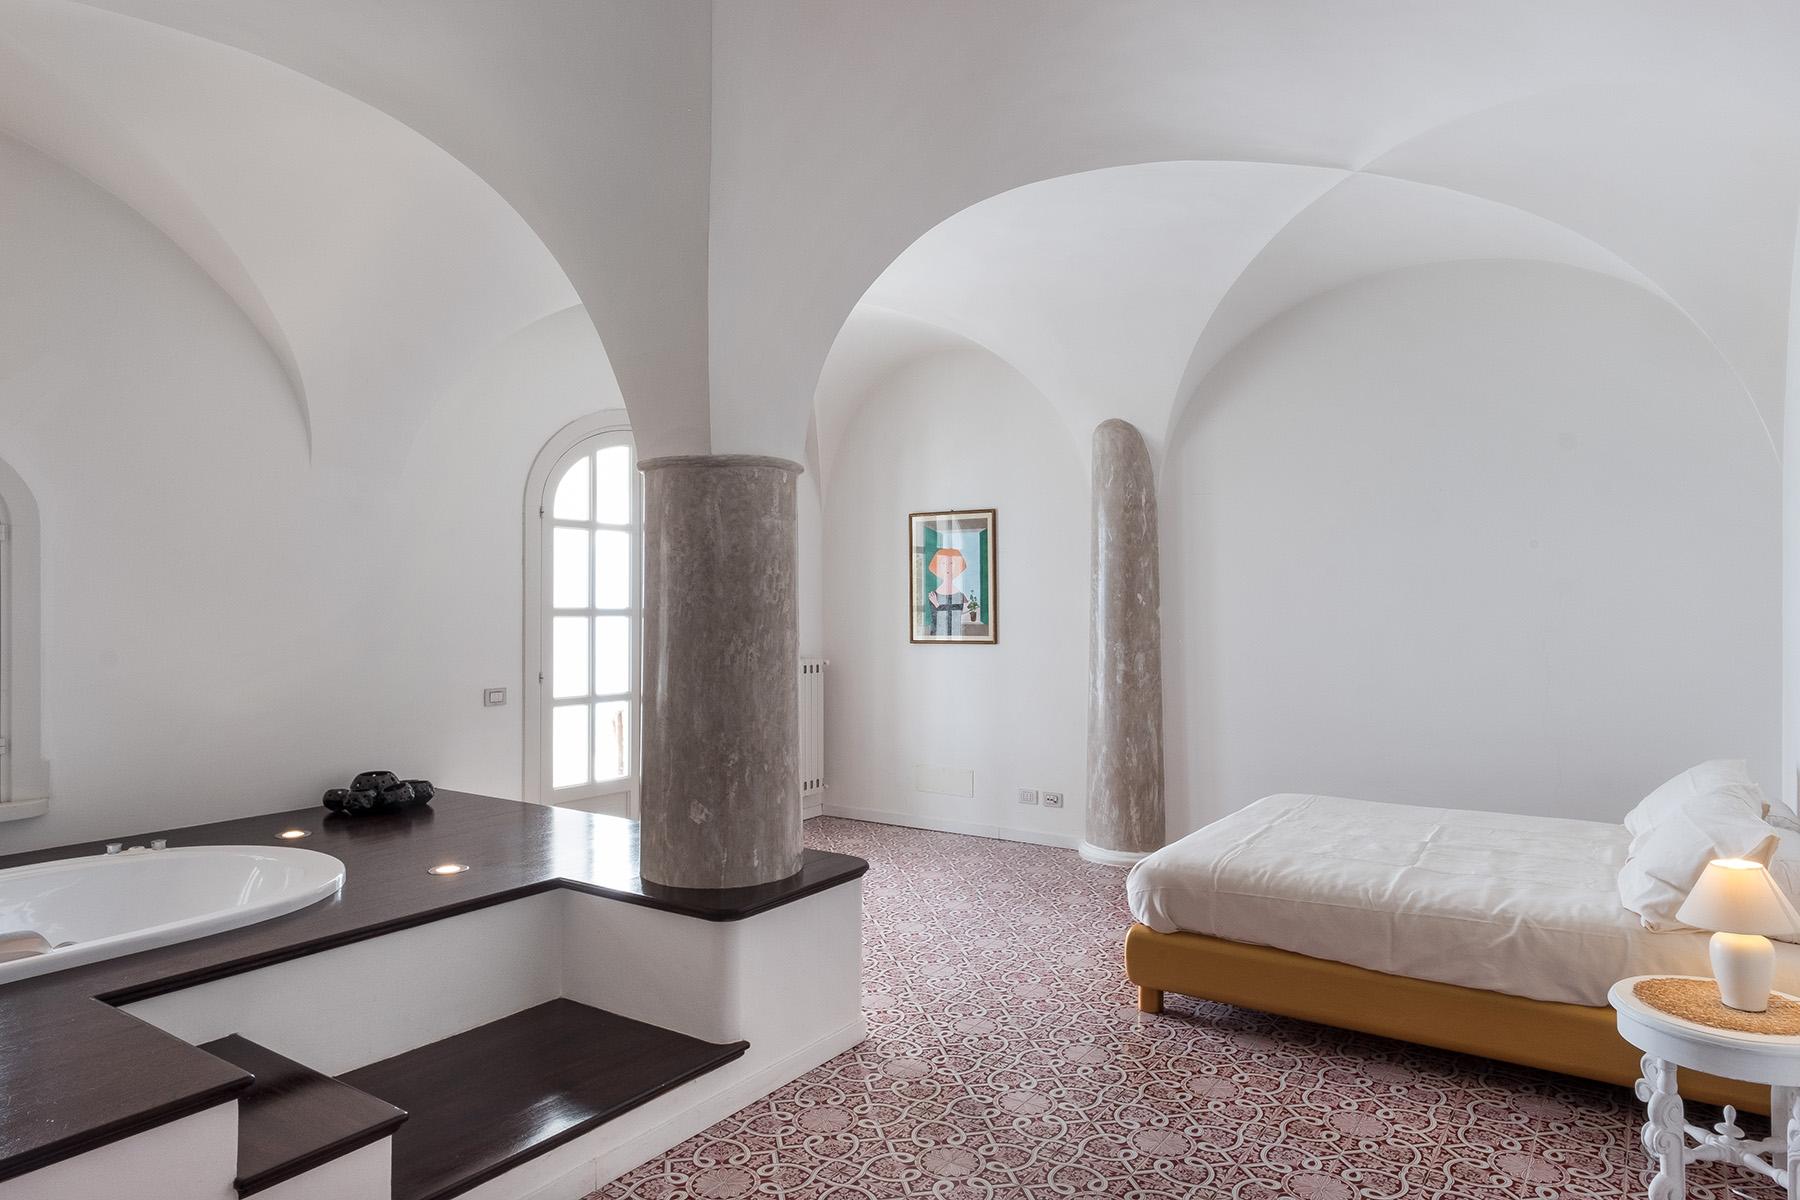 Casa indipendente in Vendita a Praiano: 4 locali, 250 mq - Foto 13